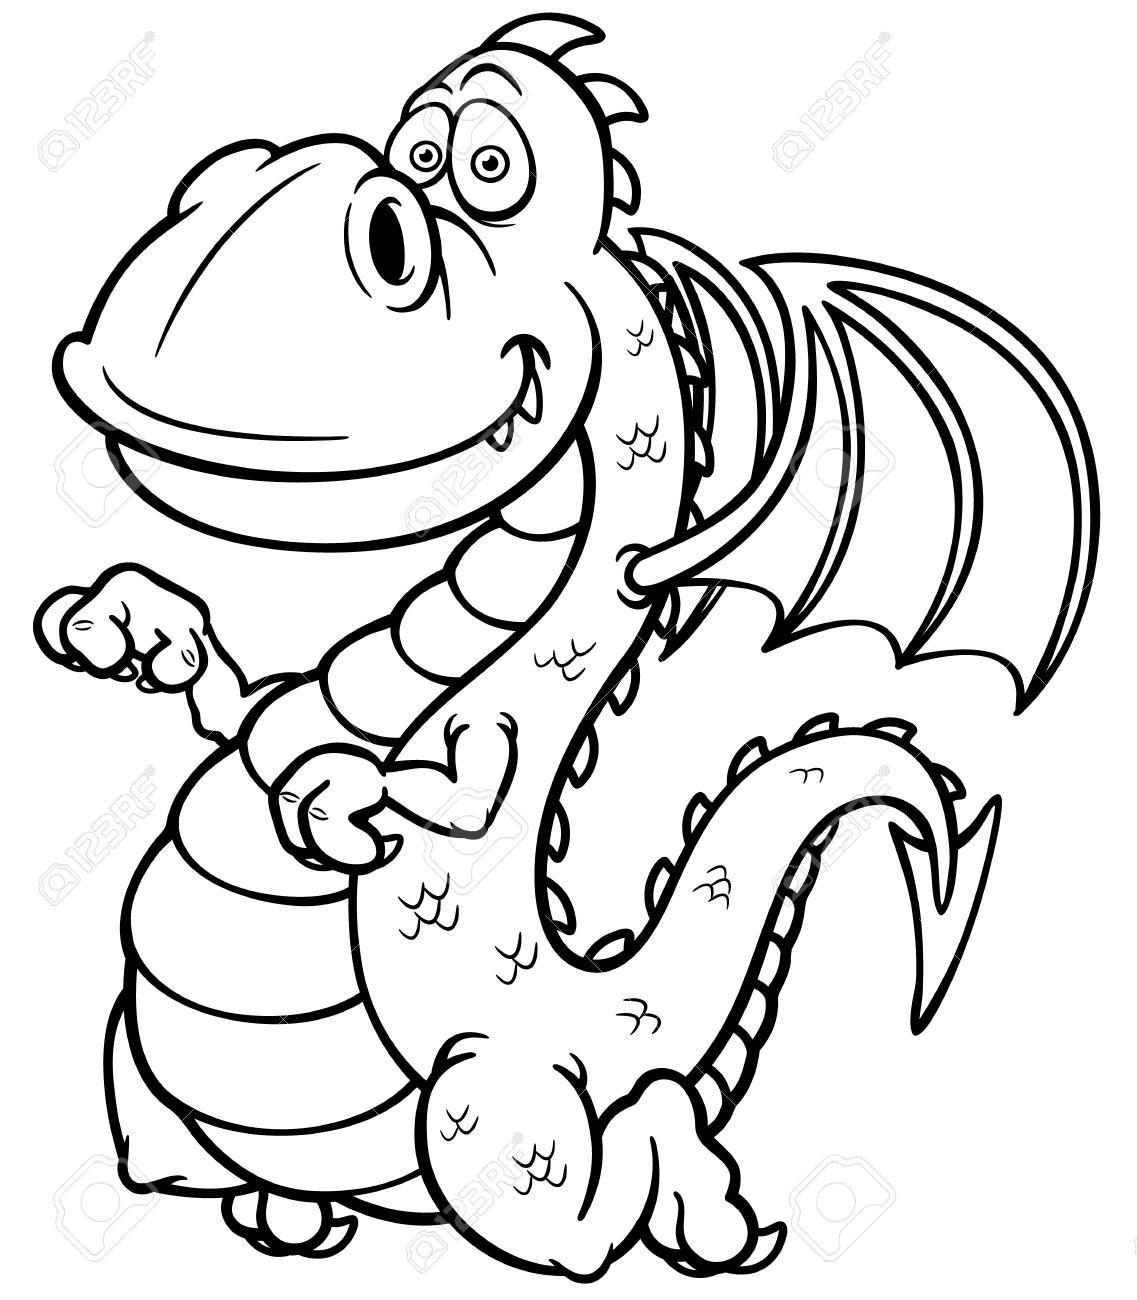 vector illustration of cartoon dragon coloring book stock vector 27322049 - Dragon Coloring Book